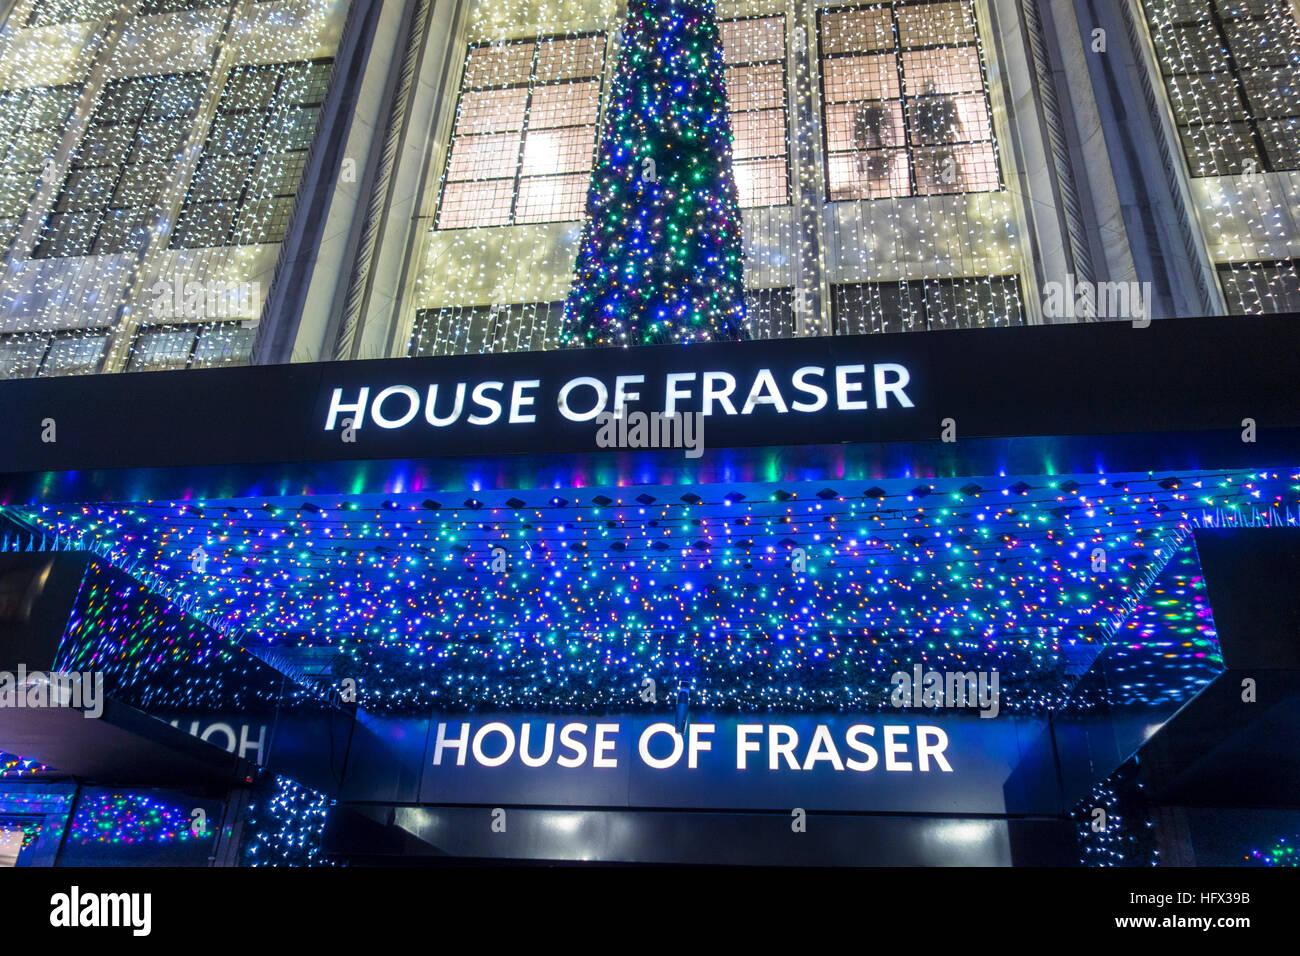 House of Fraser, Oxford Street, London. Christmas 2016 - Stock Image